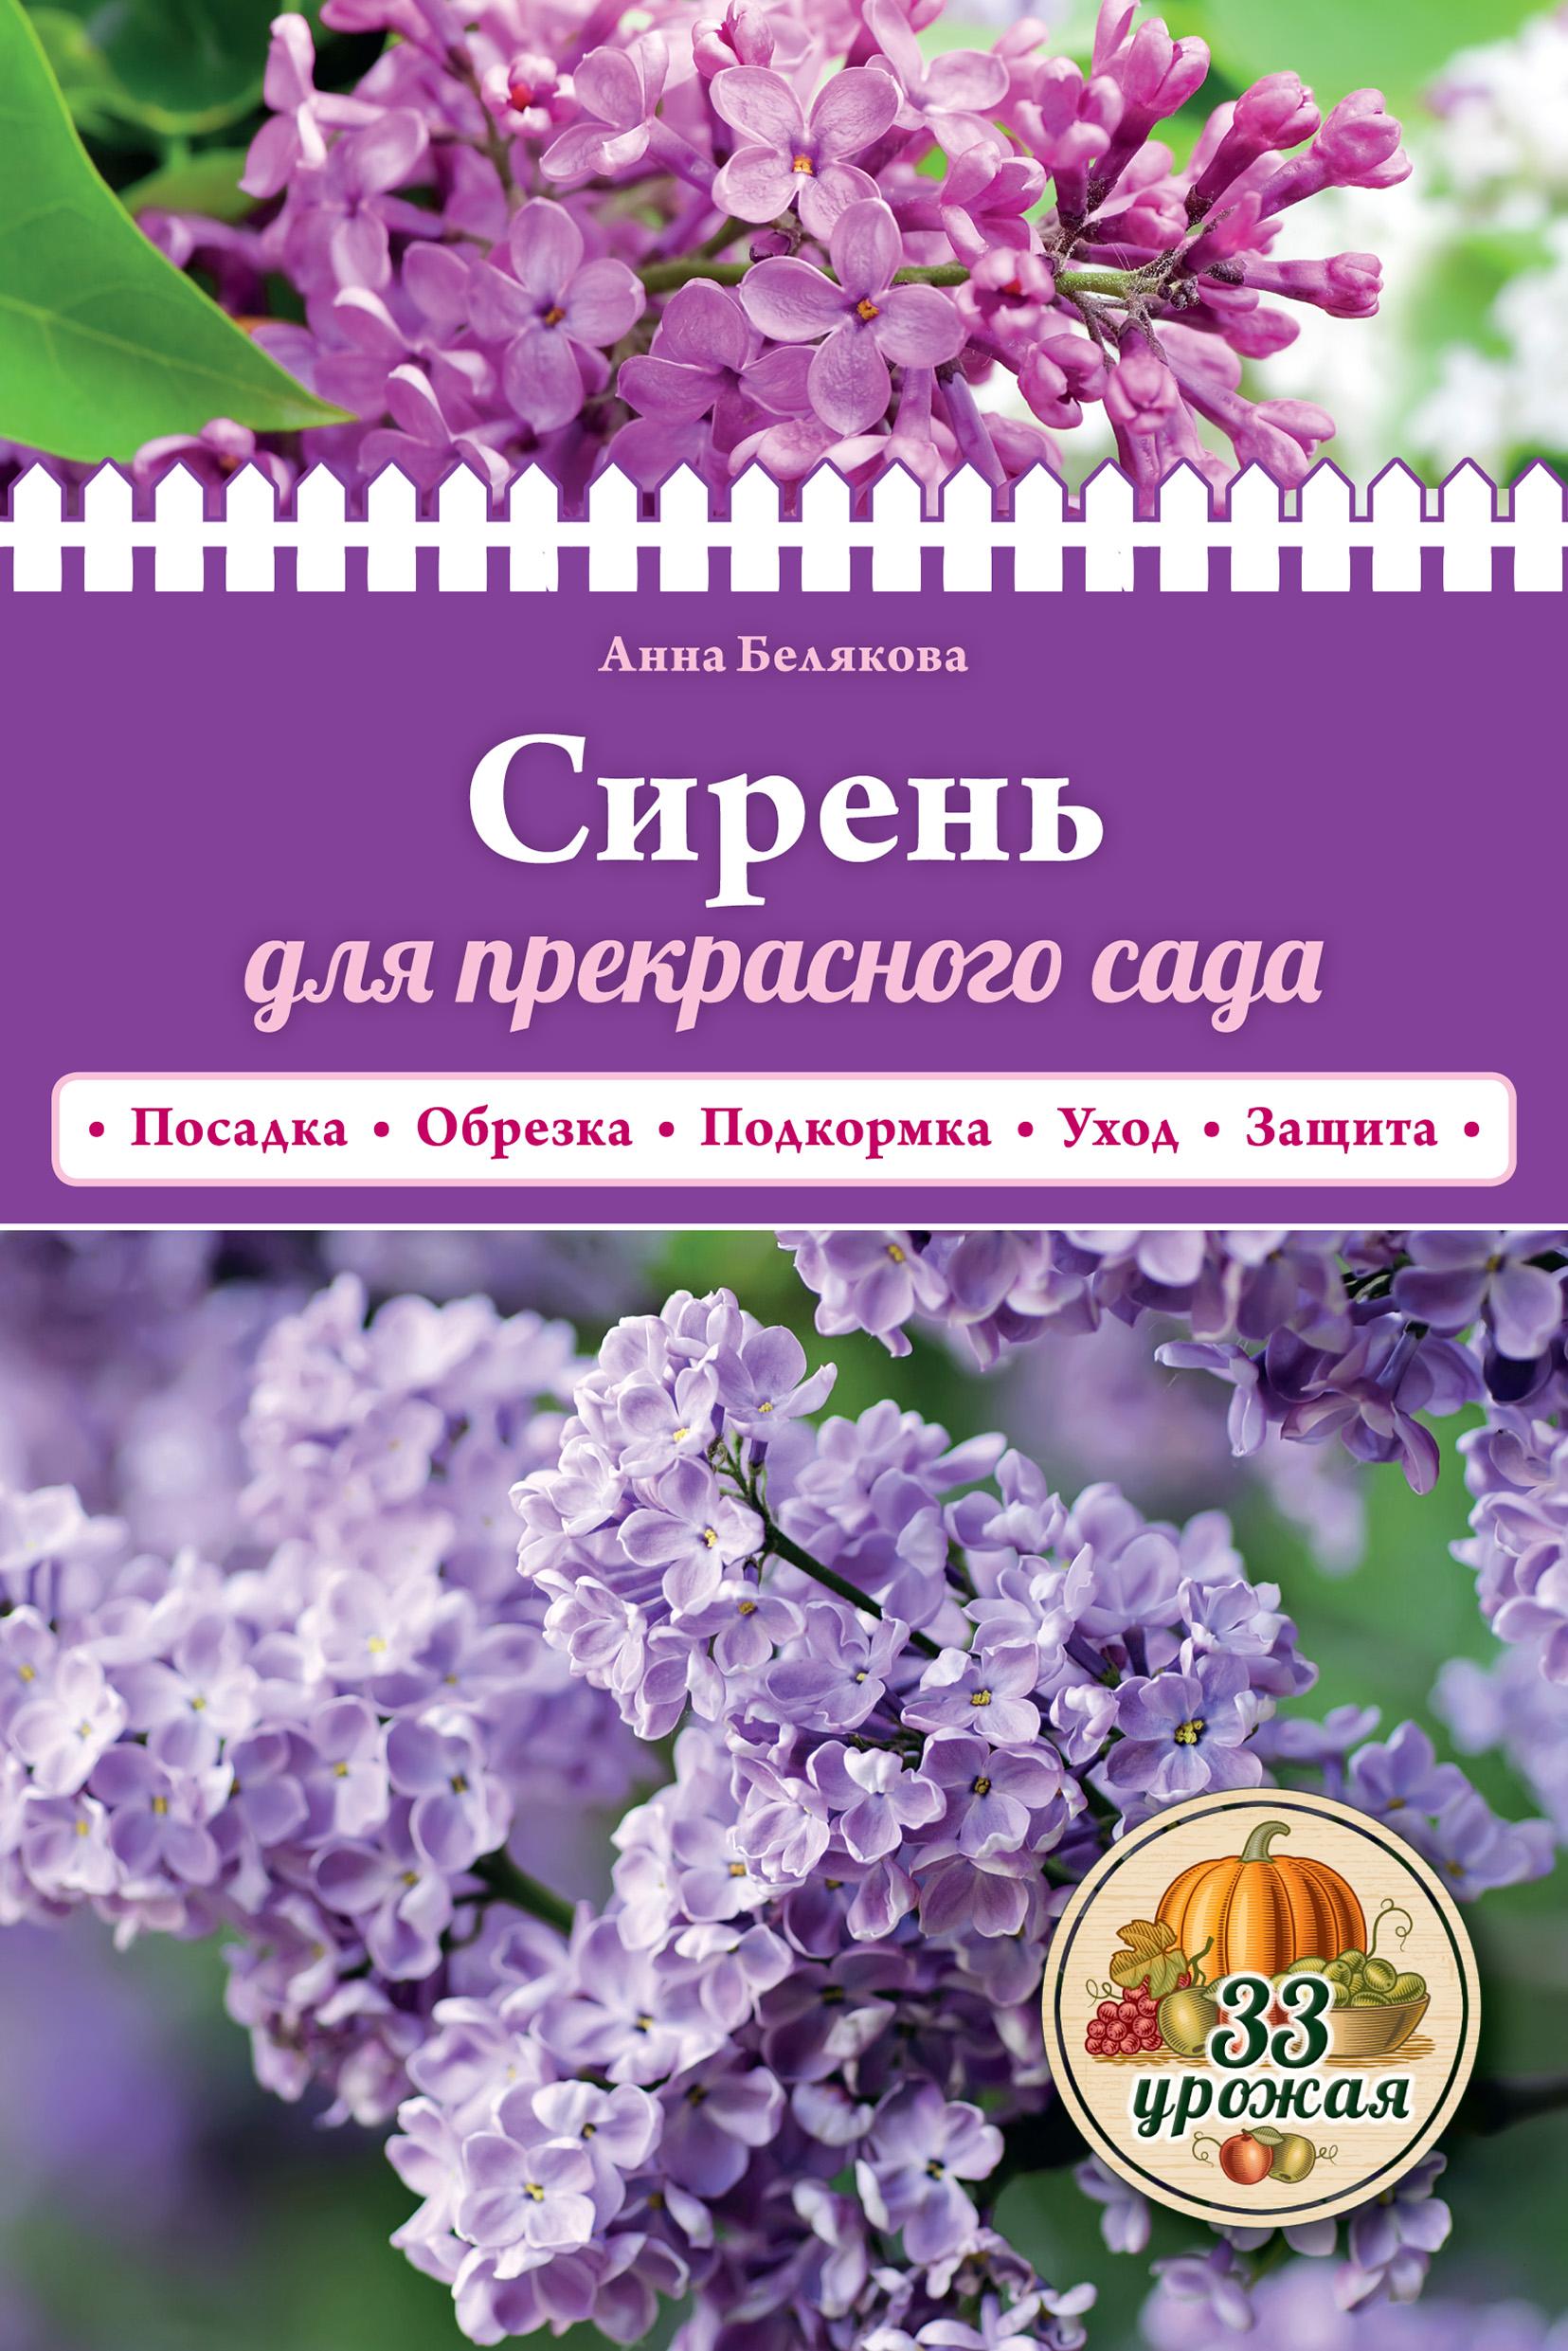 Анна Белякова Сирень для прекрасного сада белякова а сирень для прекрасного сада посадка обрезка подкормка уход защита